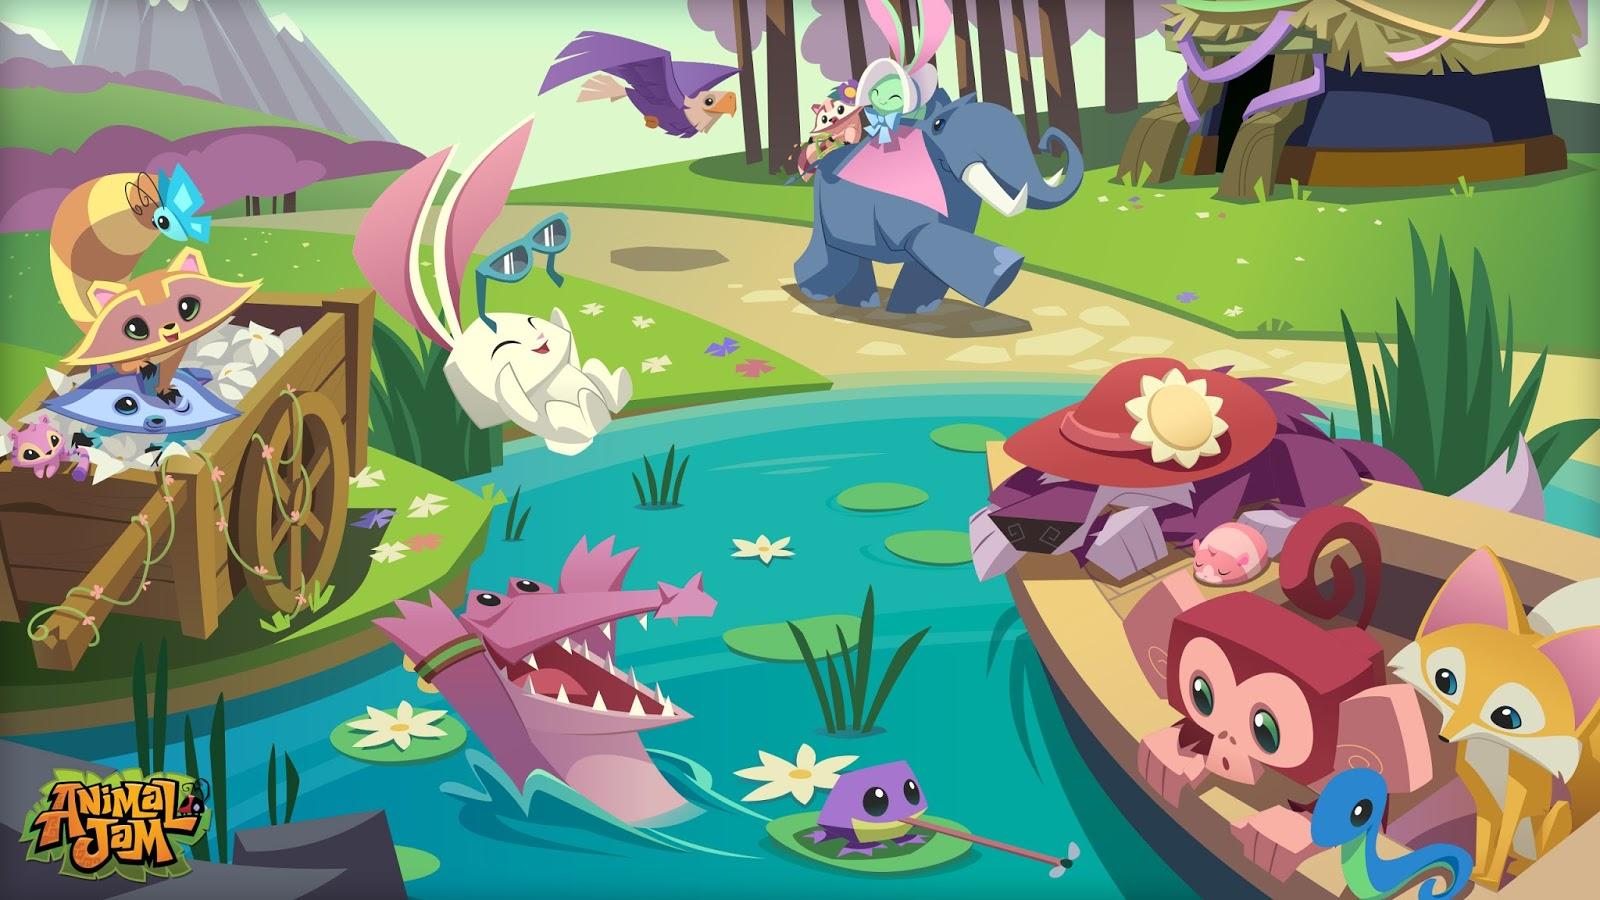 Animal jam spirit blog august 2015 - Animal jam desktop backgrounds ...